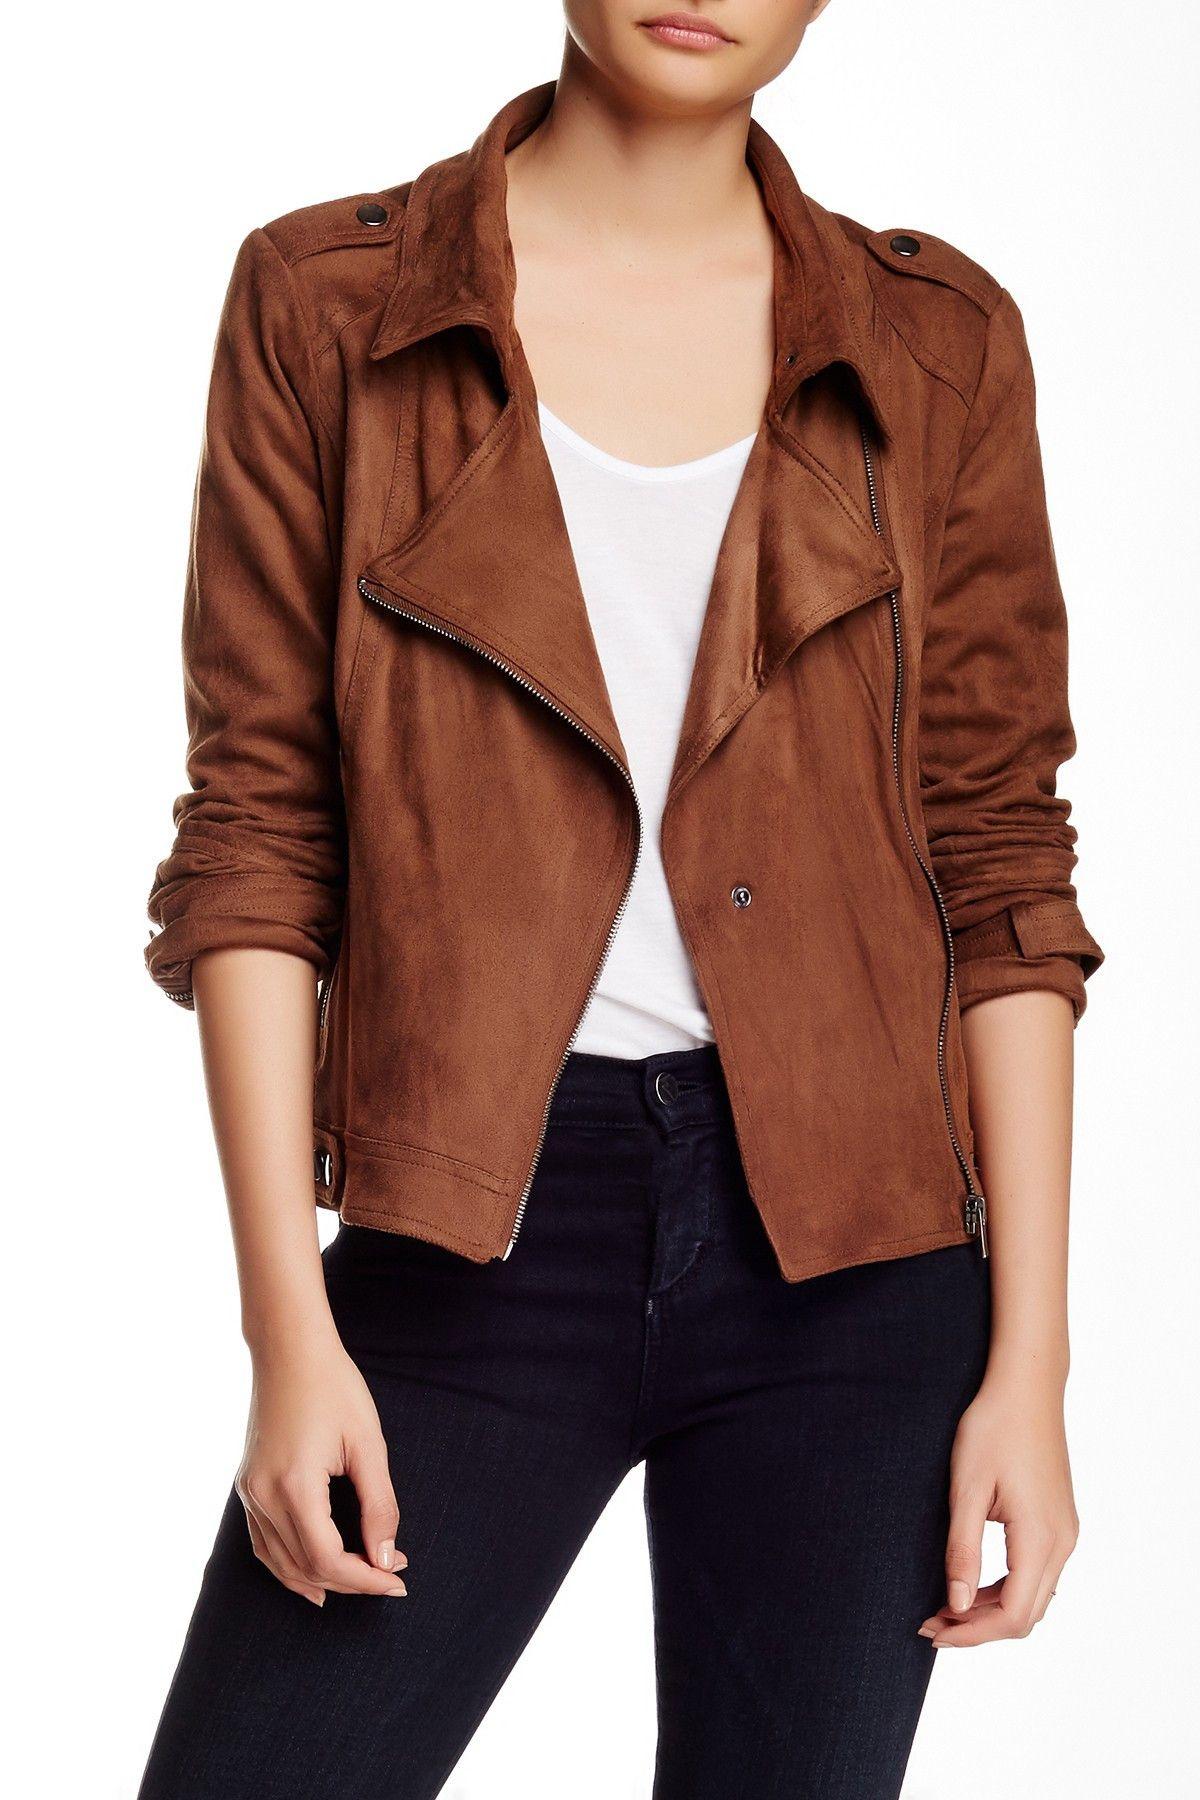 Leather jacket nordstrom rack - Bnci By Blanc Noir Faux Suede Moto Jacket Nordstrom Rack